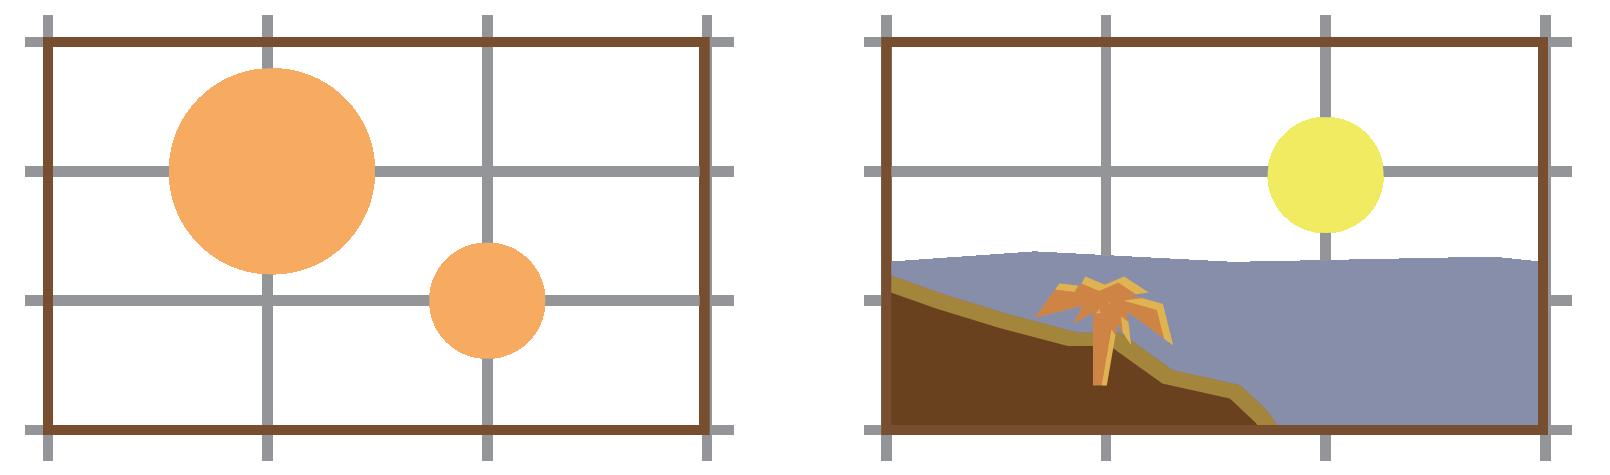 DesignSymmetryRuleOfThirds